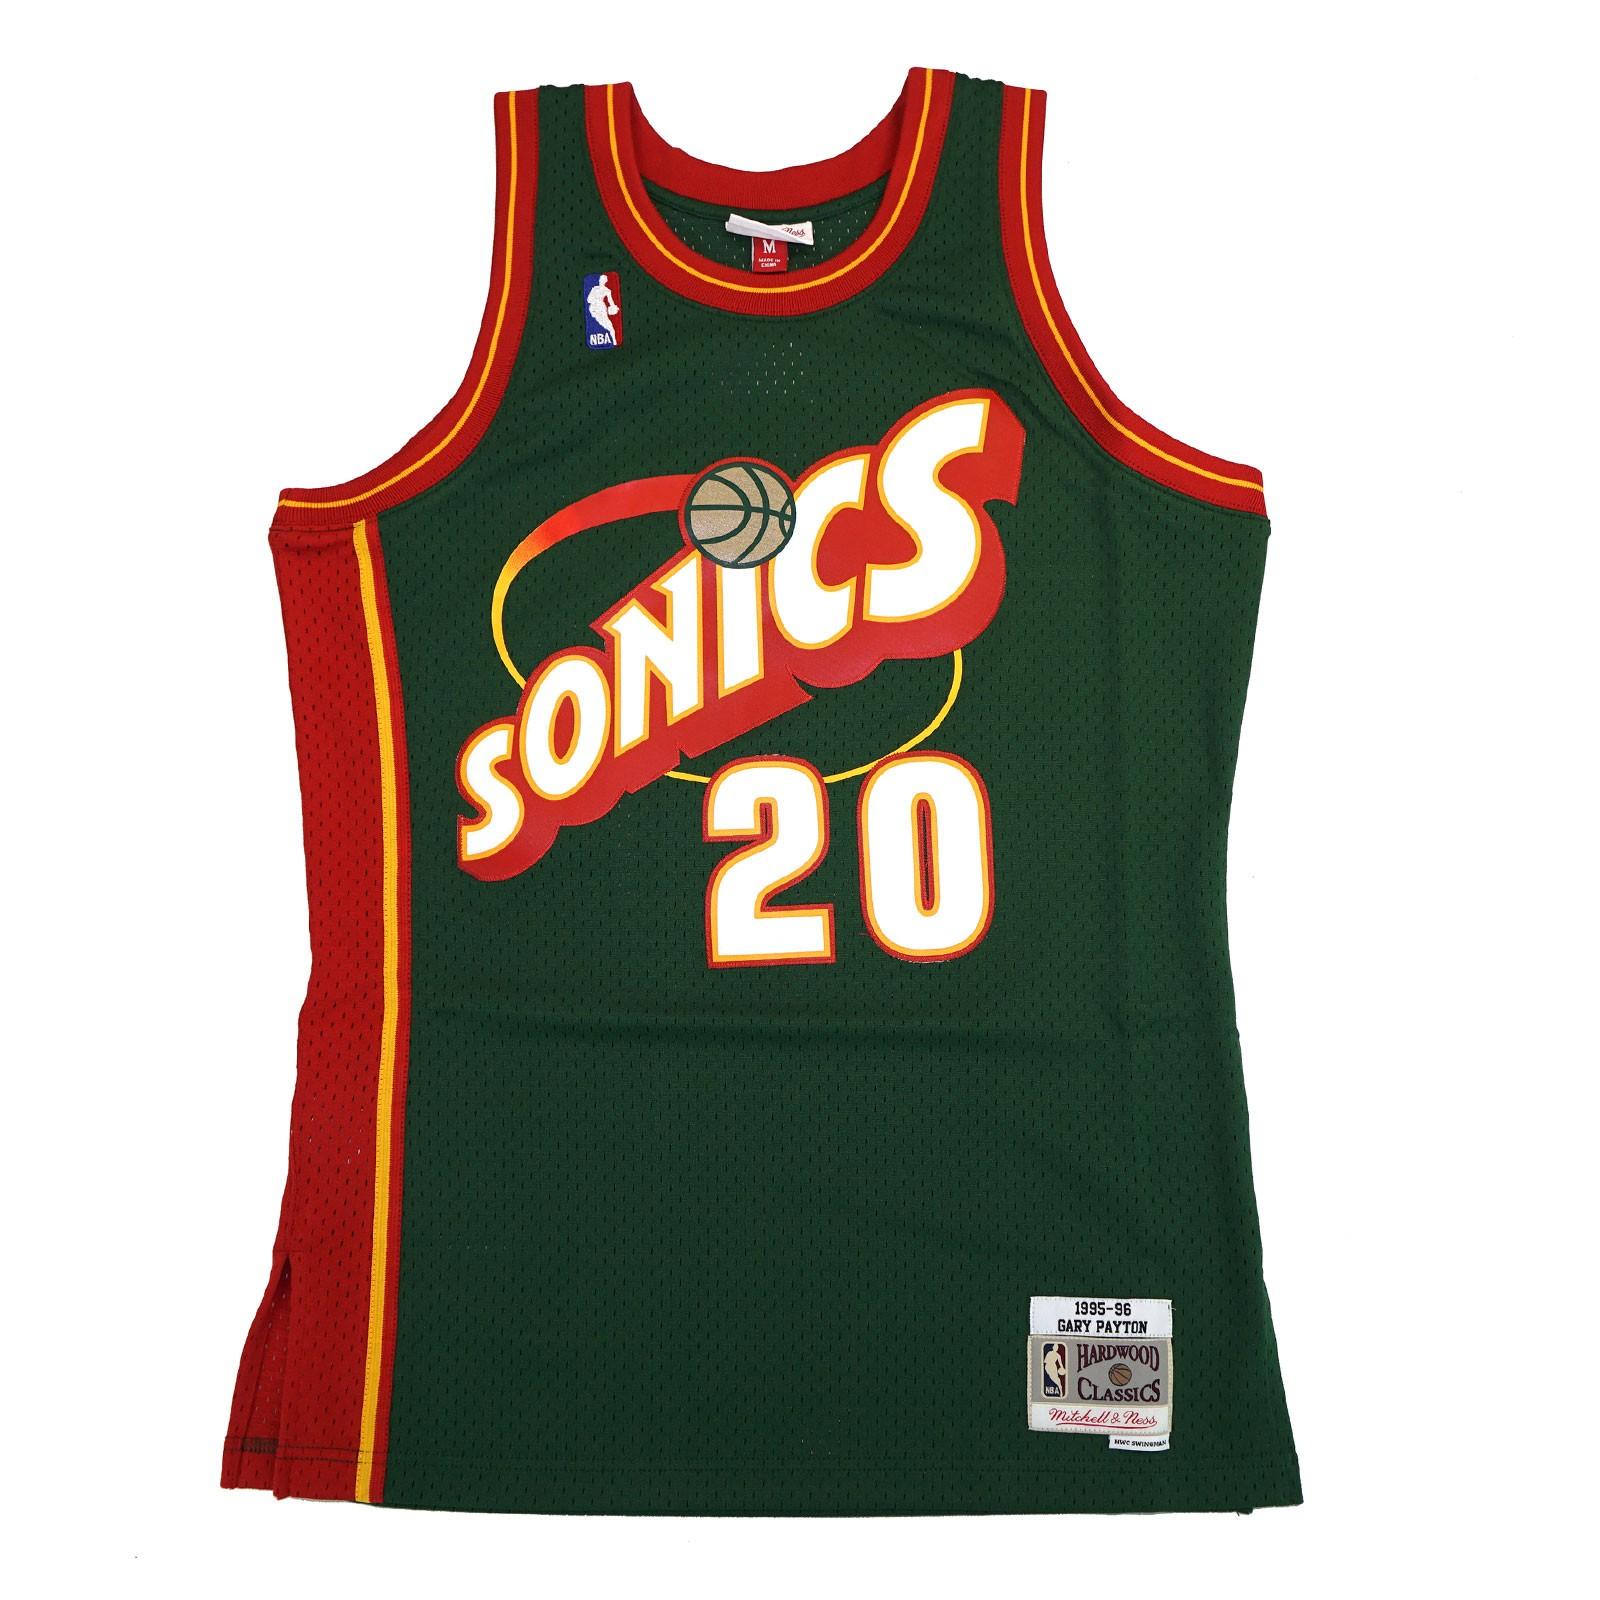 a68a799f9 ... wholesale details about gary payton 1995 96 seattle supersonics  mitchell ness swingman jersey mens 03941 ac234